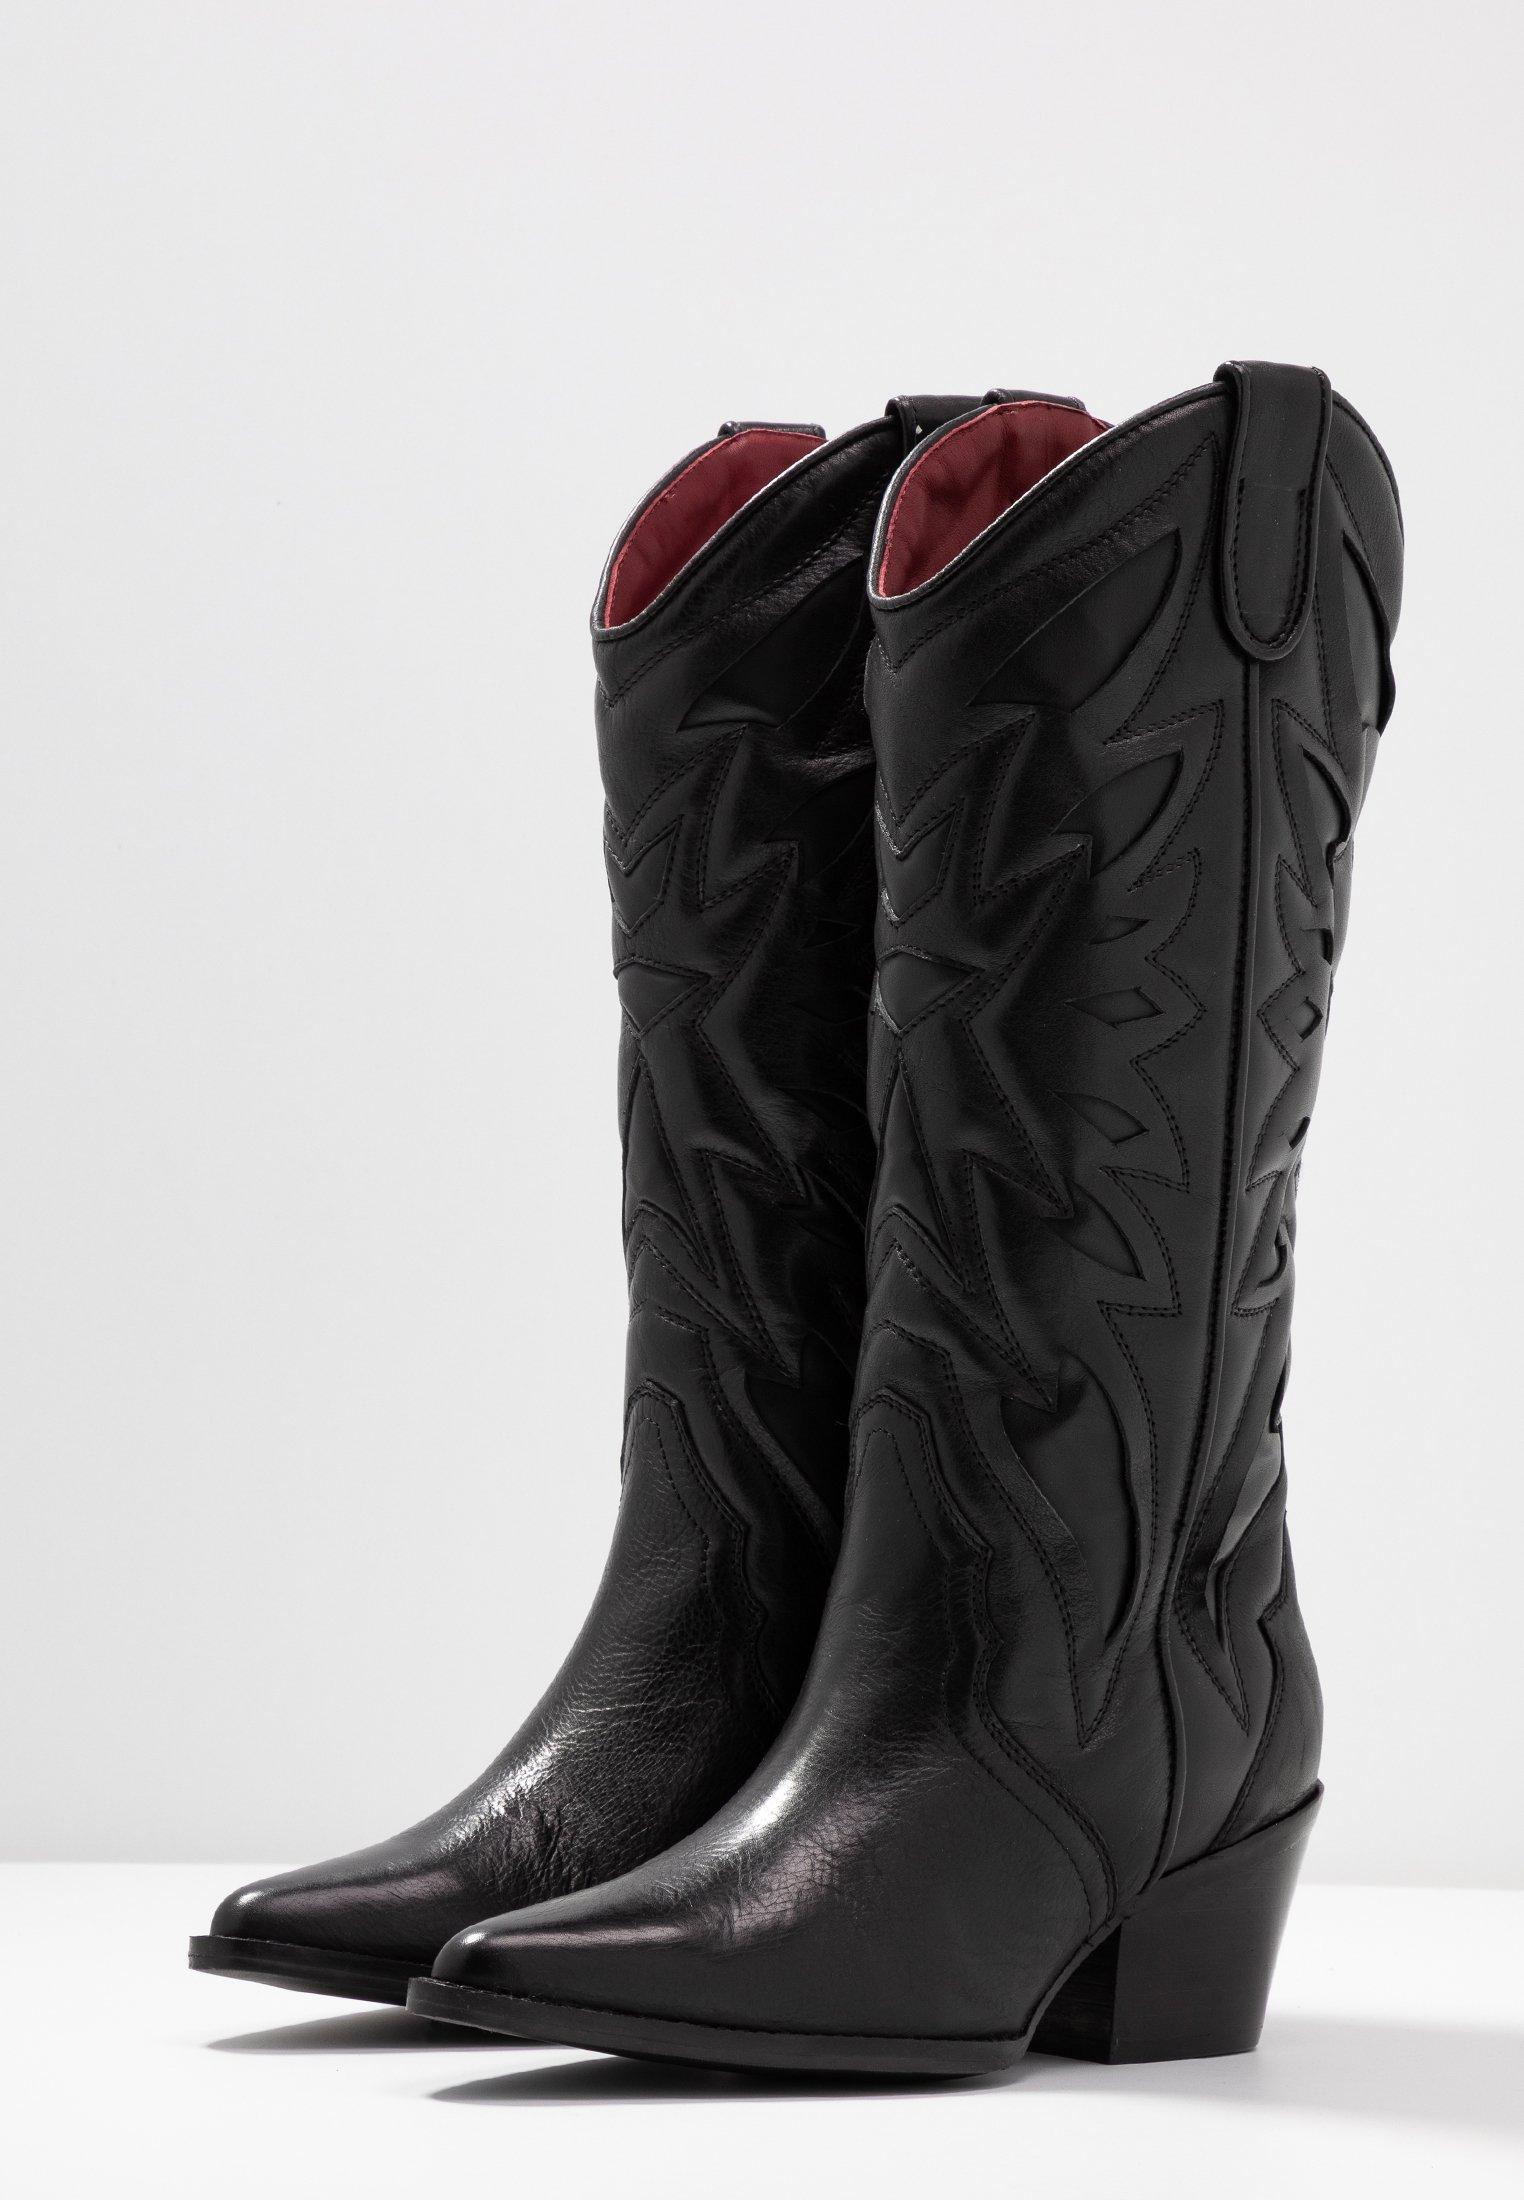 2020 Newest Excellent Women's Shoes Bronx JUKESON Cowboy/Biker boots black 90JGjvewb R5RL5tAPW